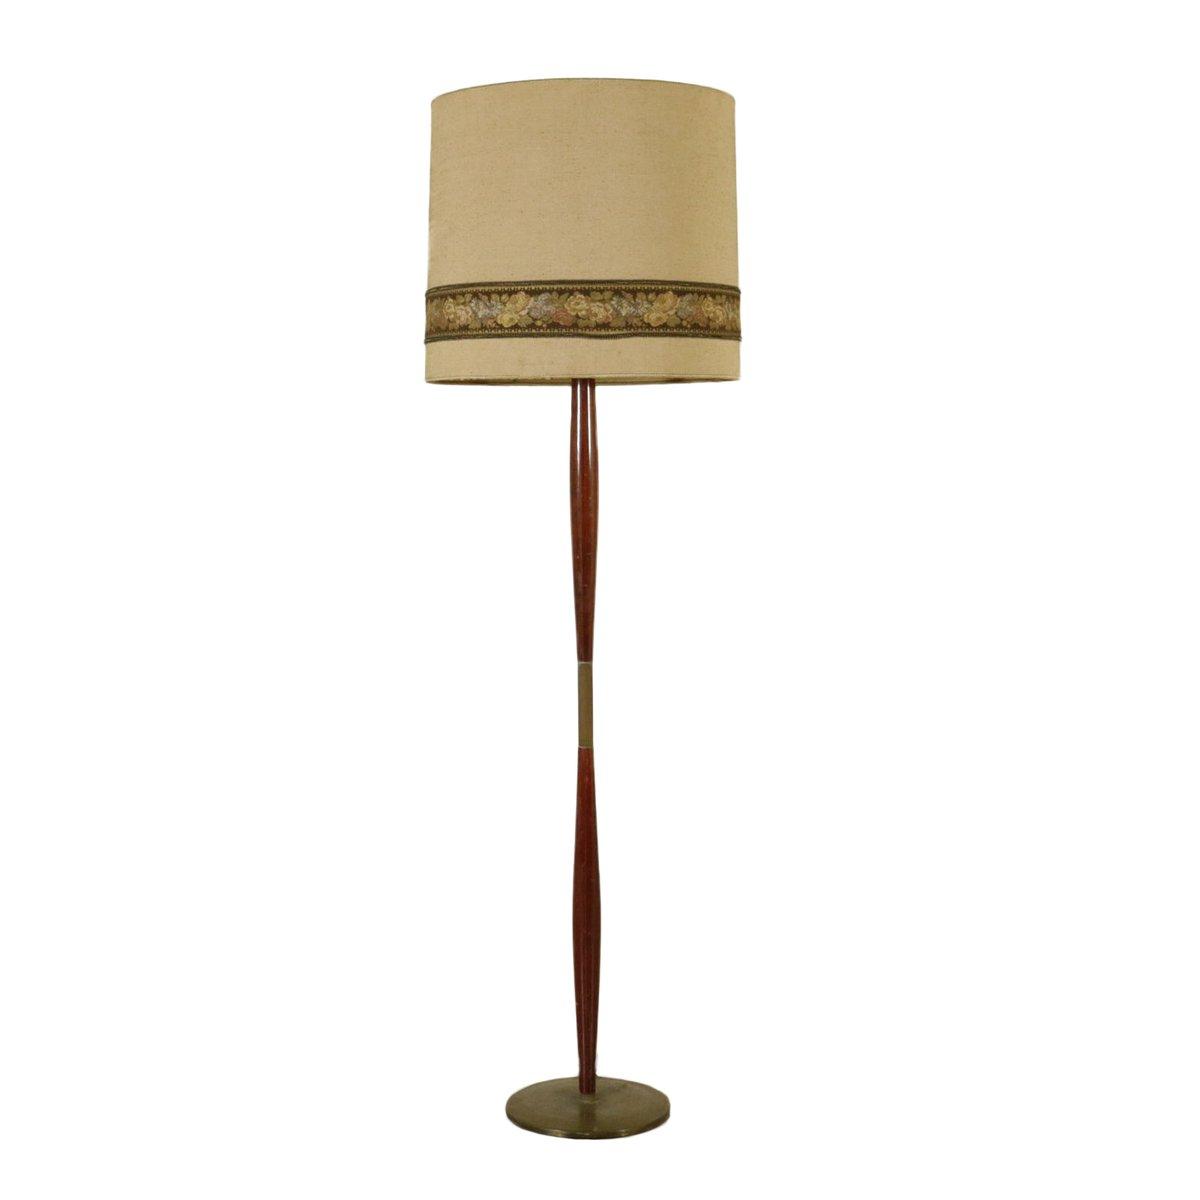 stehlampe aus holz messing 1950er bei pamono kaufen. Black Bedroom Furniture Sets. Home Design Ideas